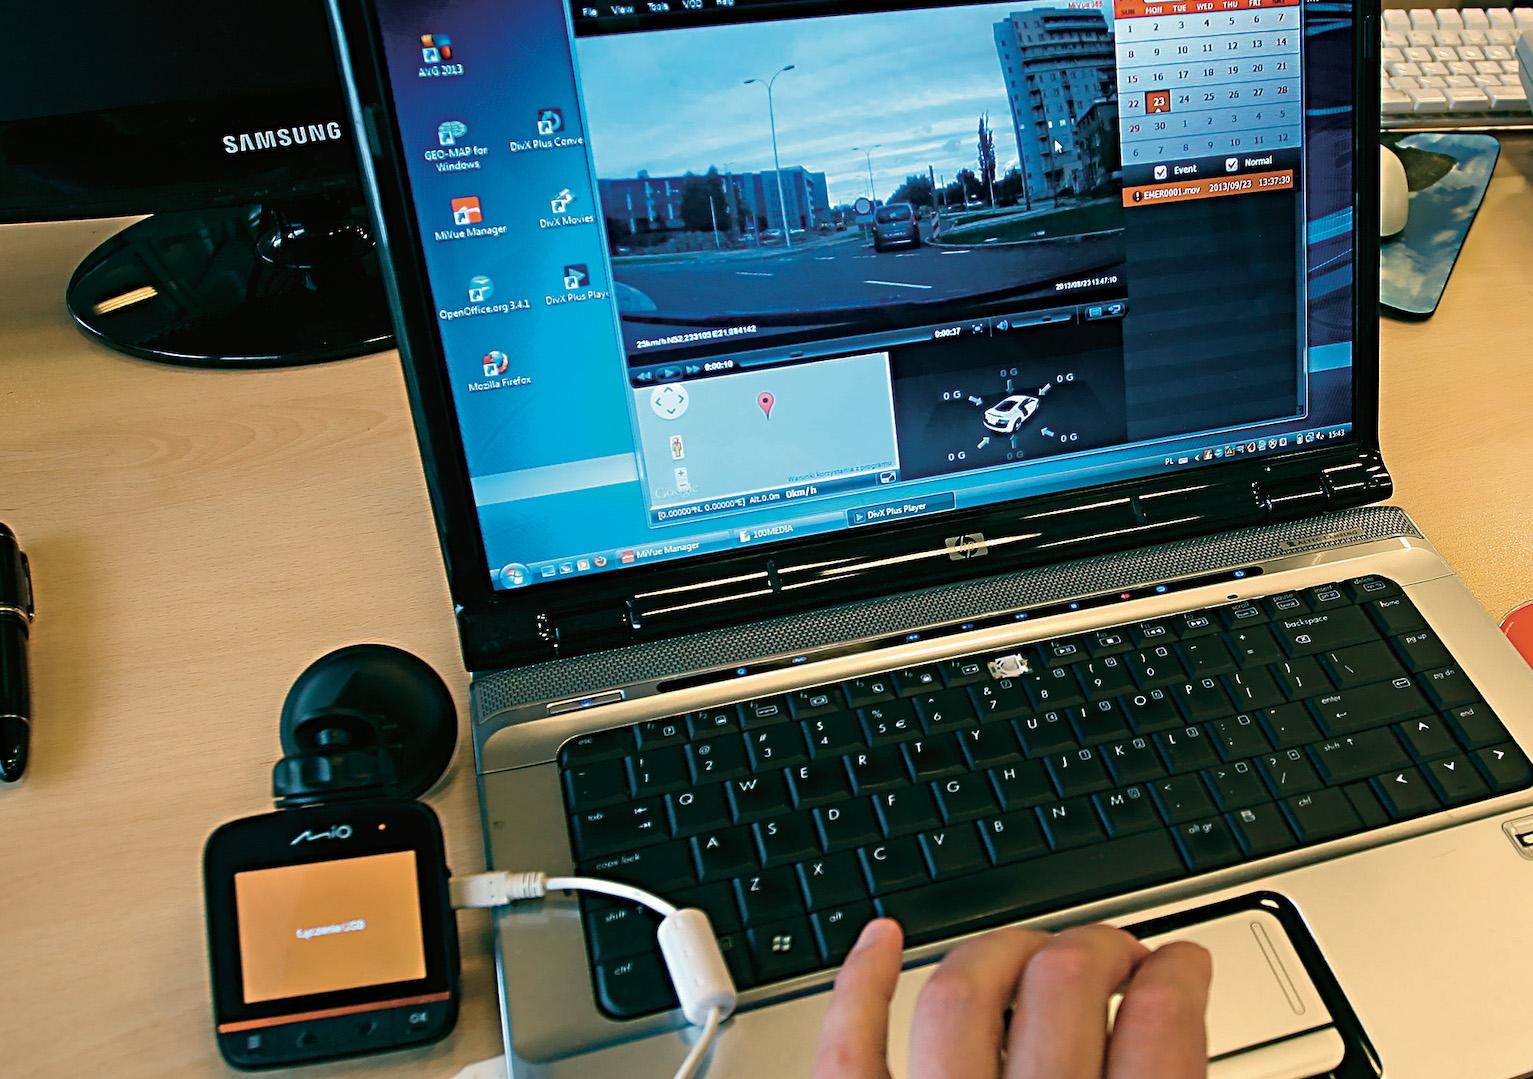 Kamera aplikacja komputerowa